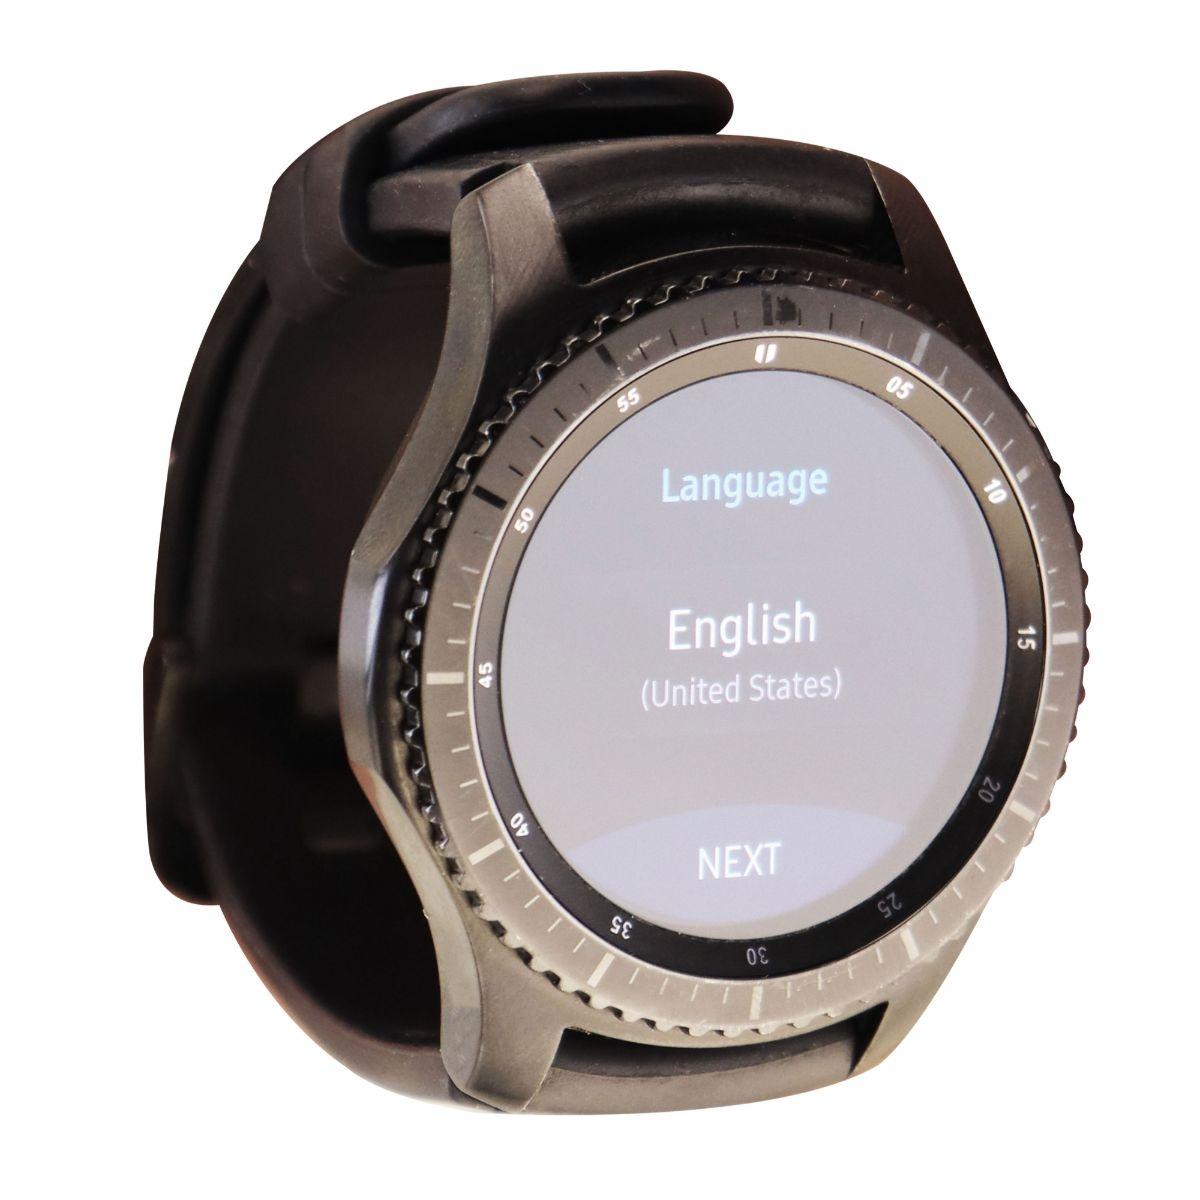 Samsung Gear S3 Frontier 46mm Smart Watch - Dark Gray - SM-R765A (AT&T ONLY)